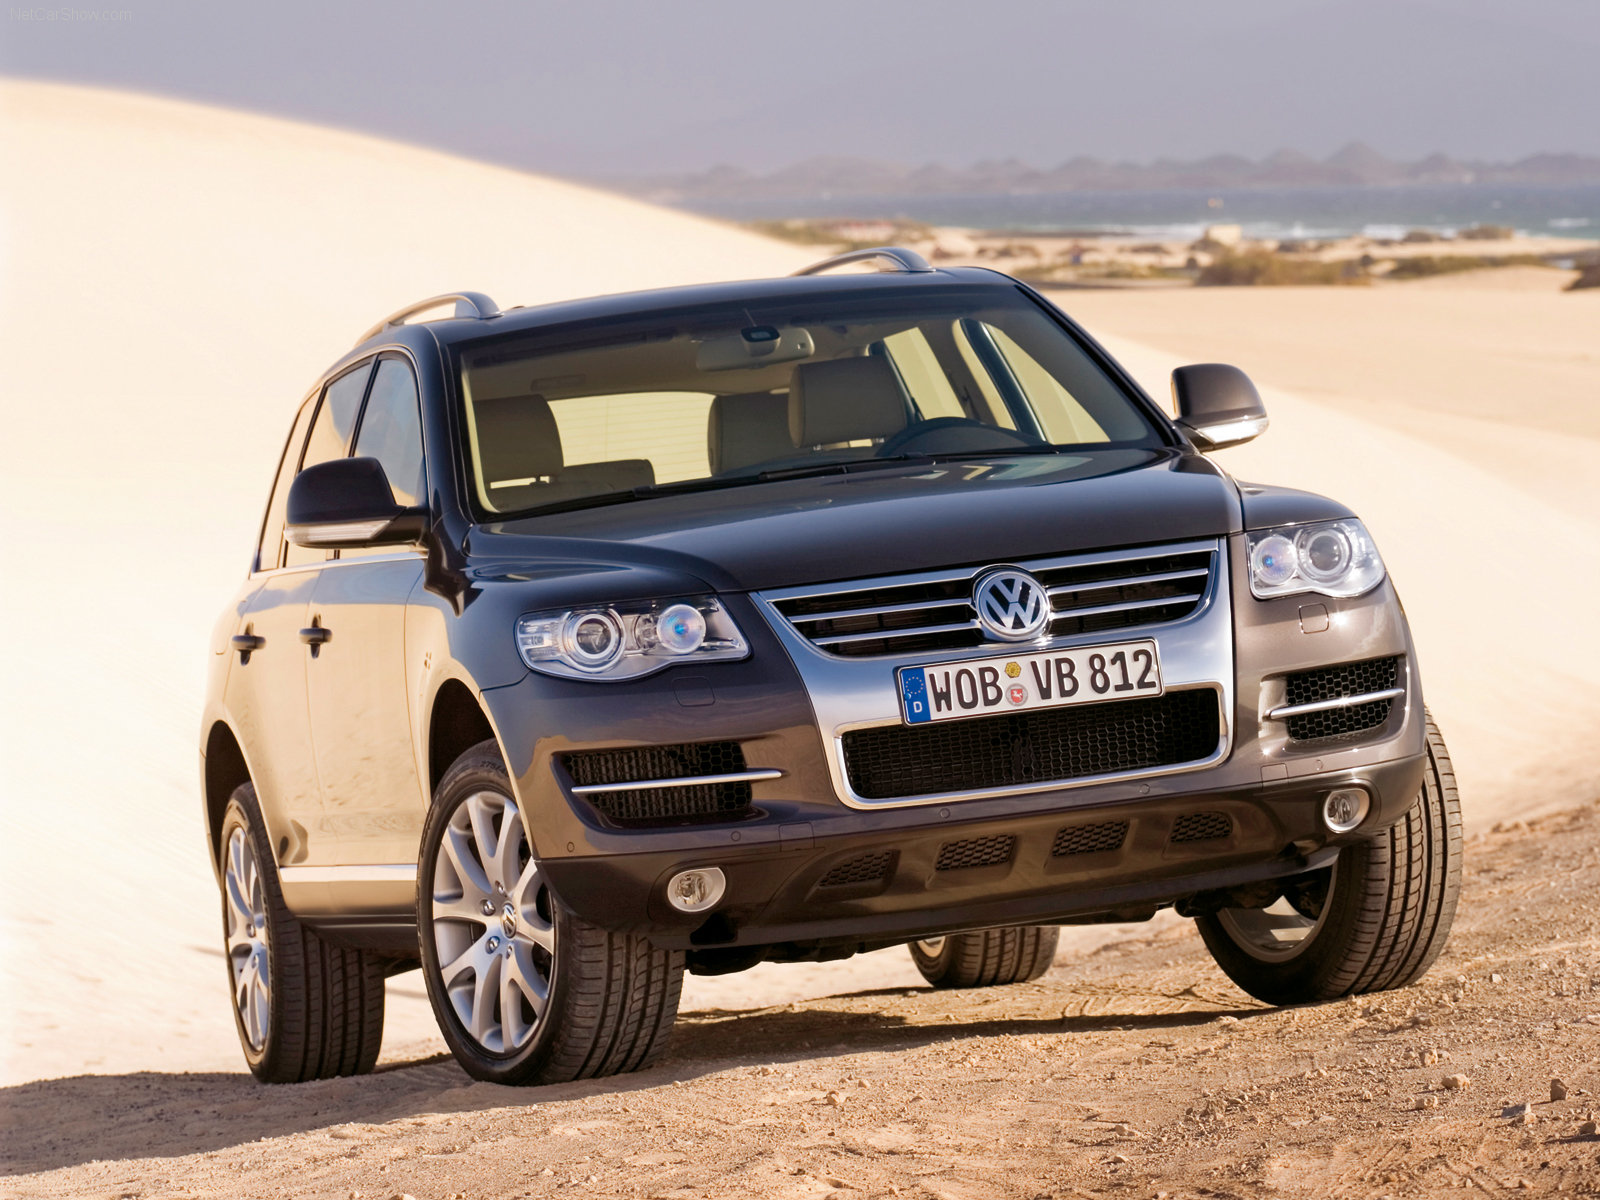 http://w04.ru/foto/Volkswagen-Touareg_2007_1600x1200_wallpaper_04.jpg